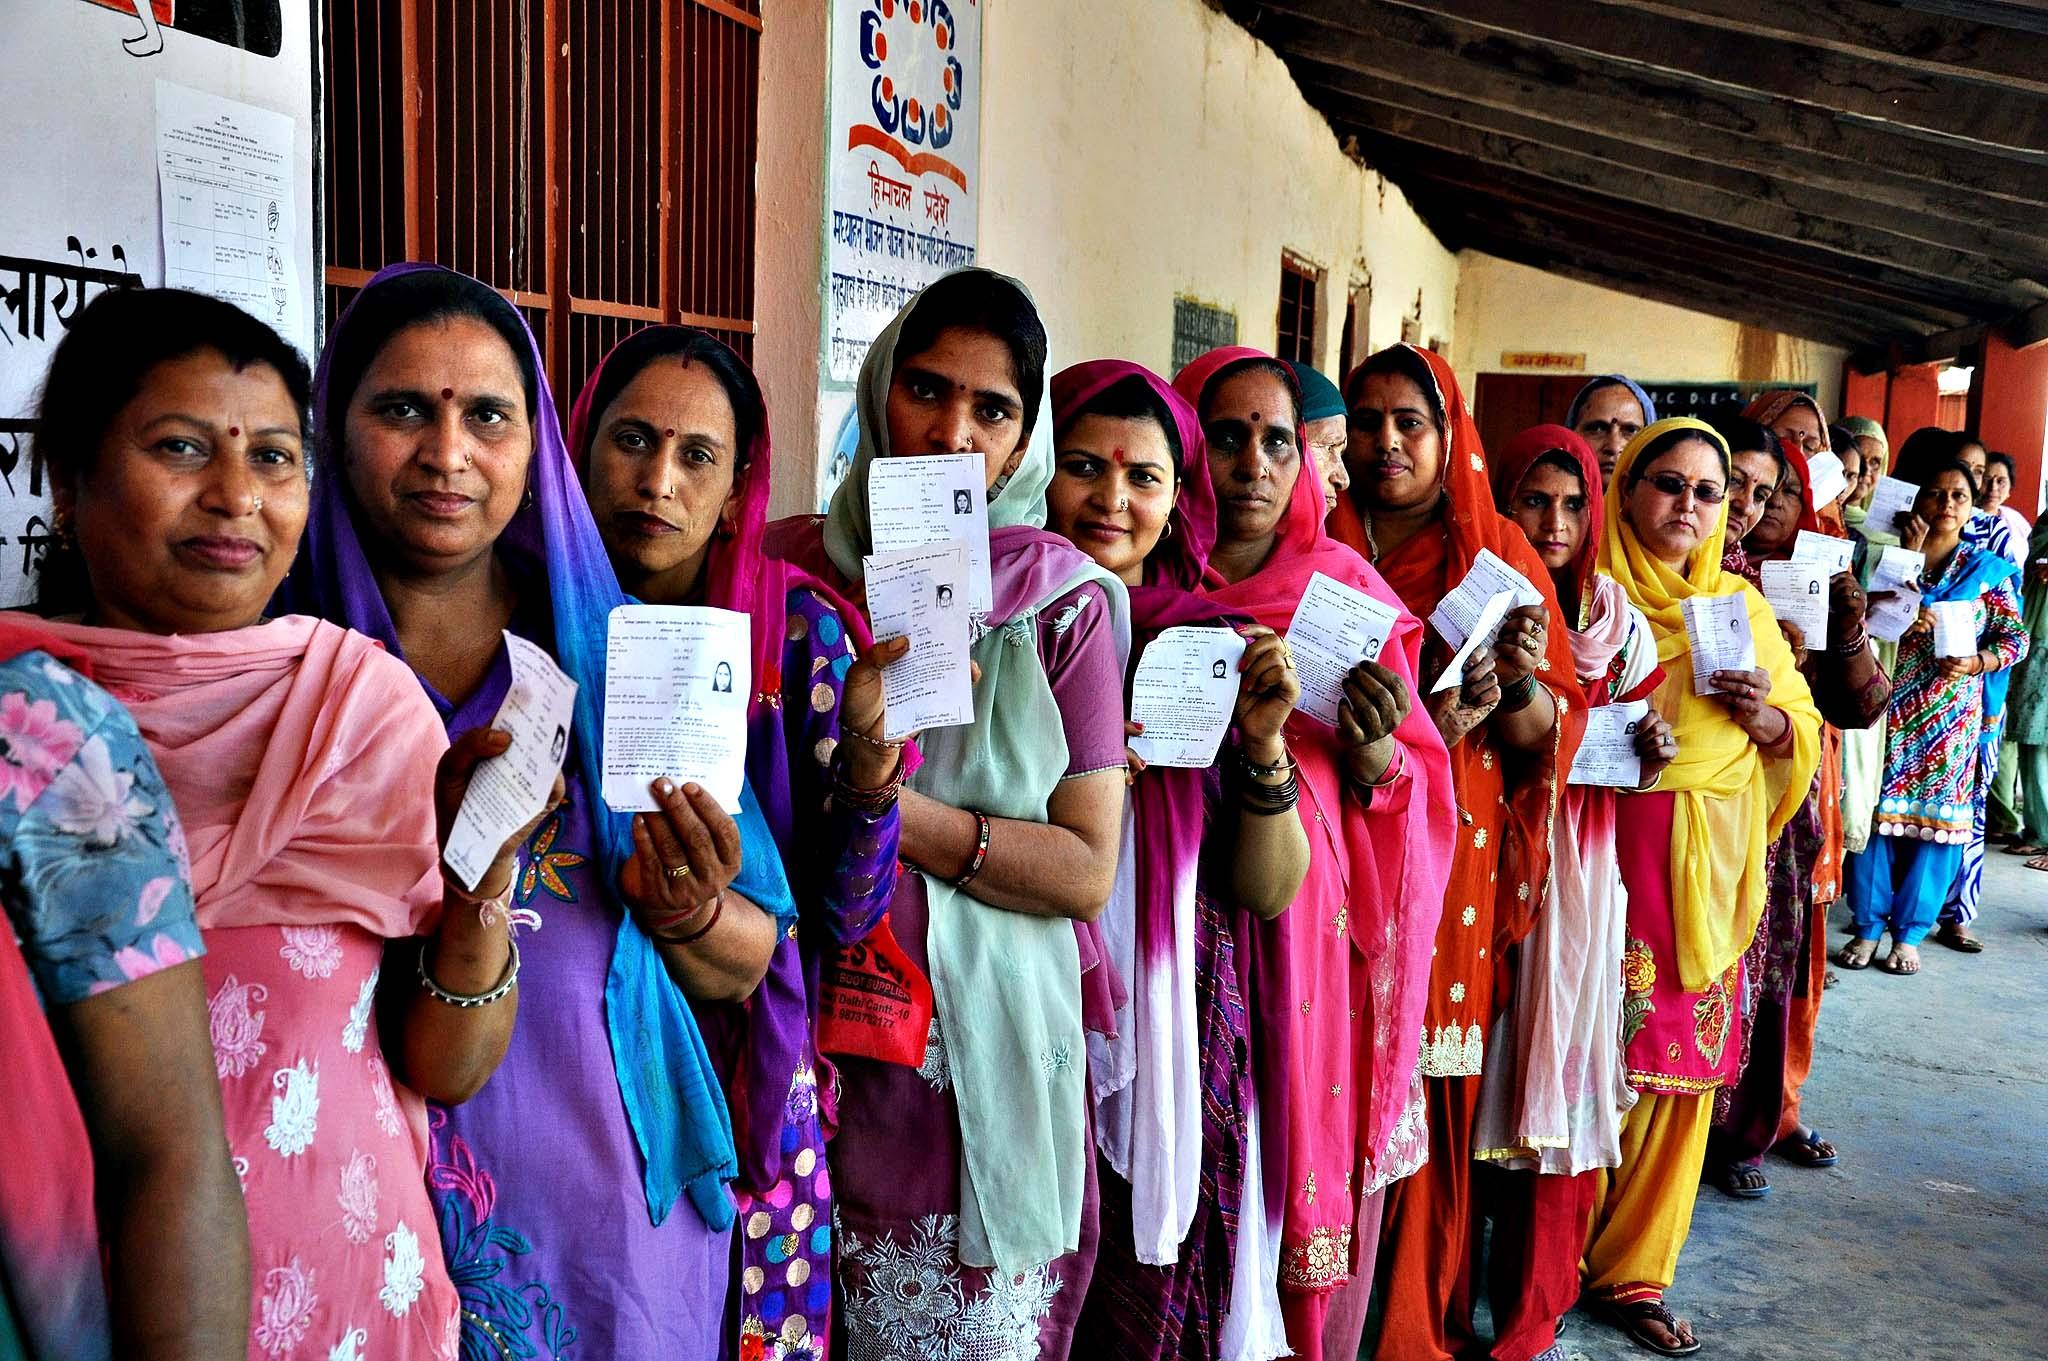 Le elezioni regionali indiane